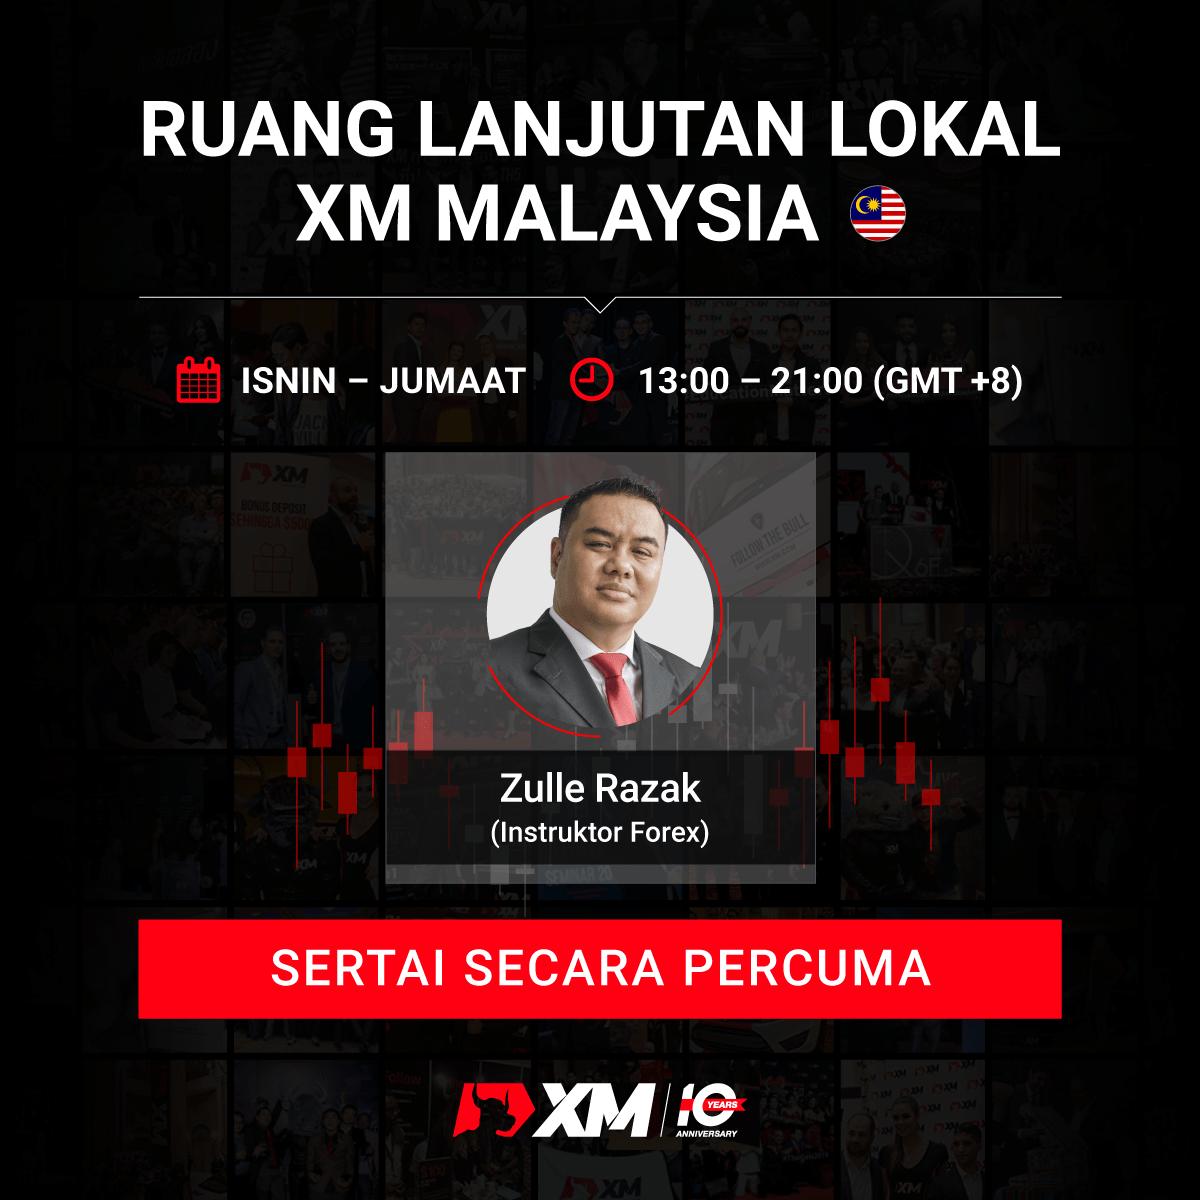 Ruang Lanjutan Lokal XM Malaysia